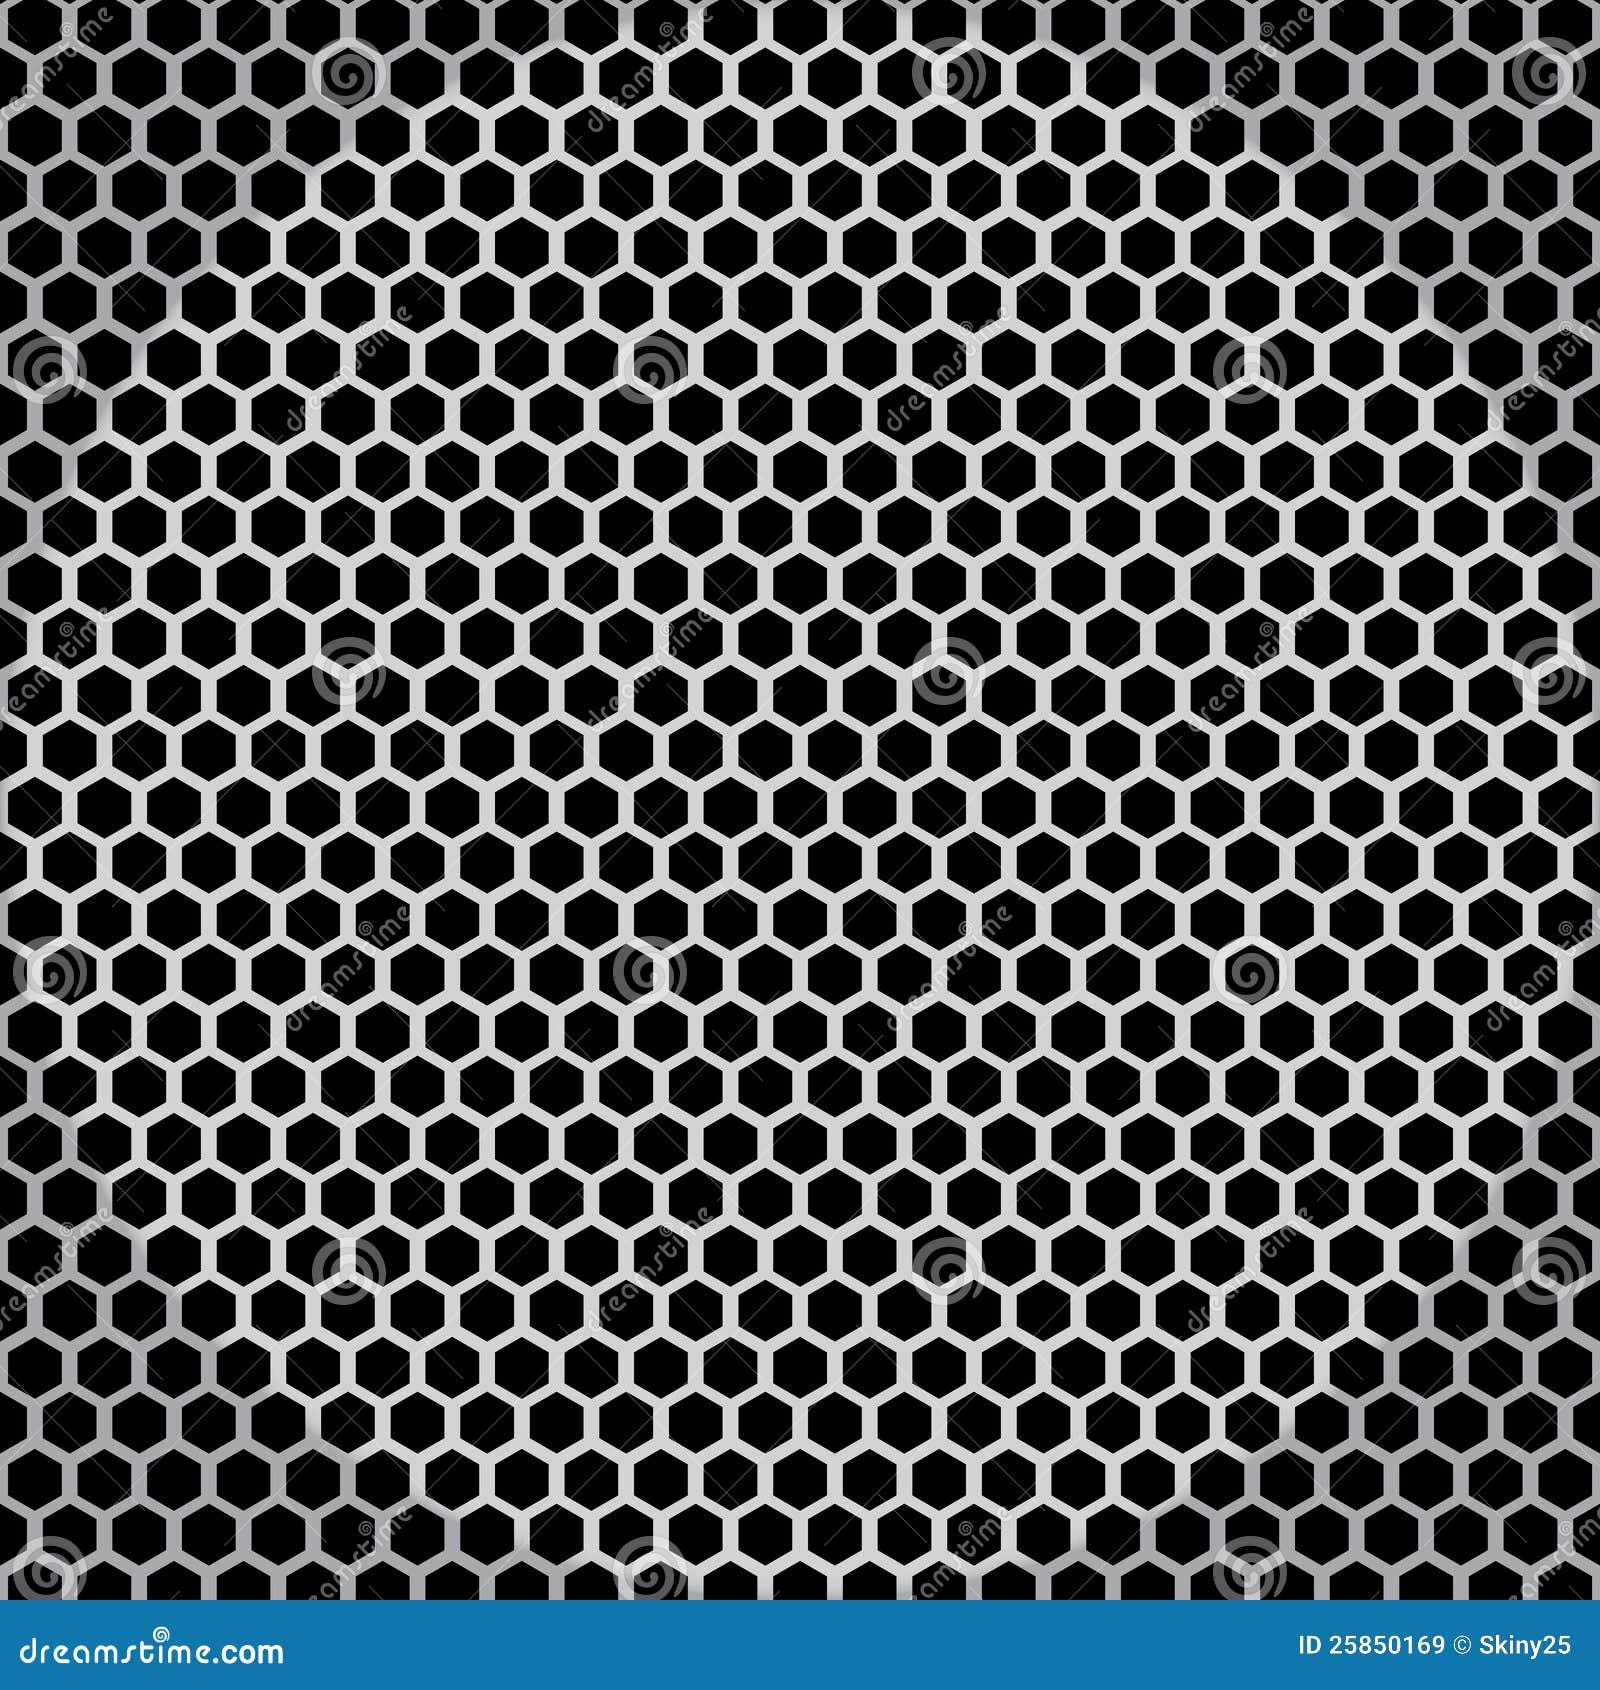 Metal Net Seamless Texture Stock Vector Illustration Of